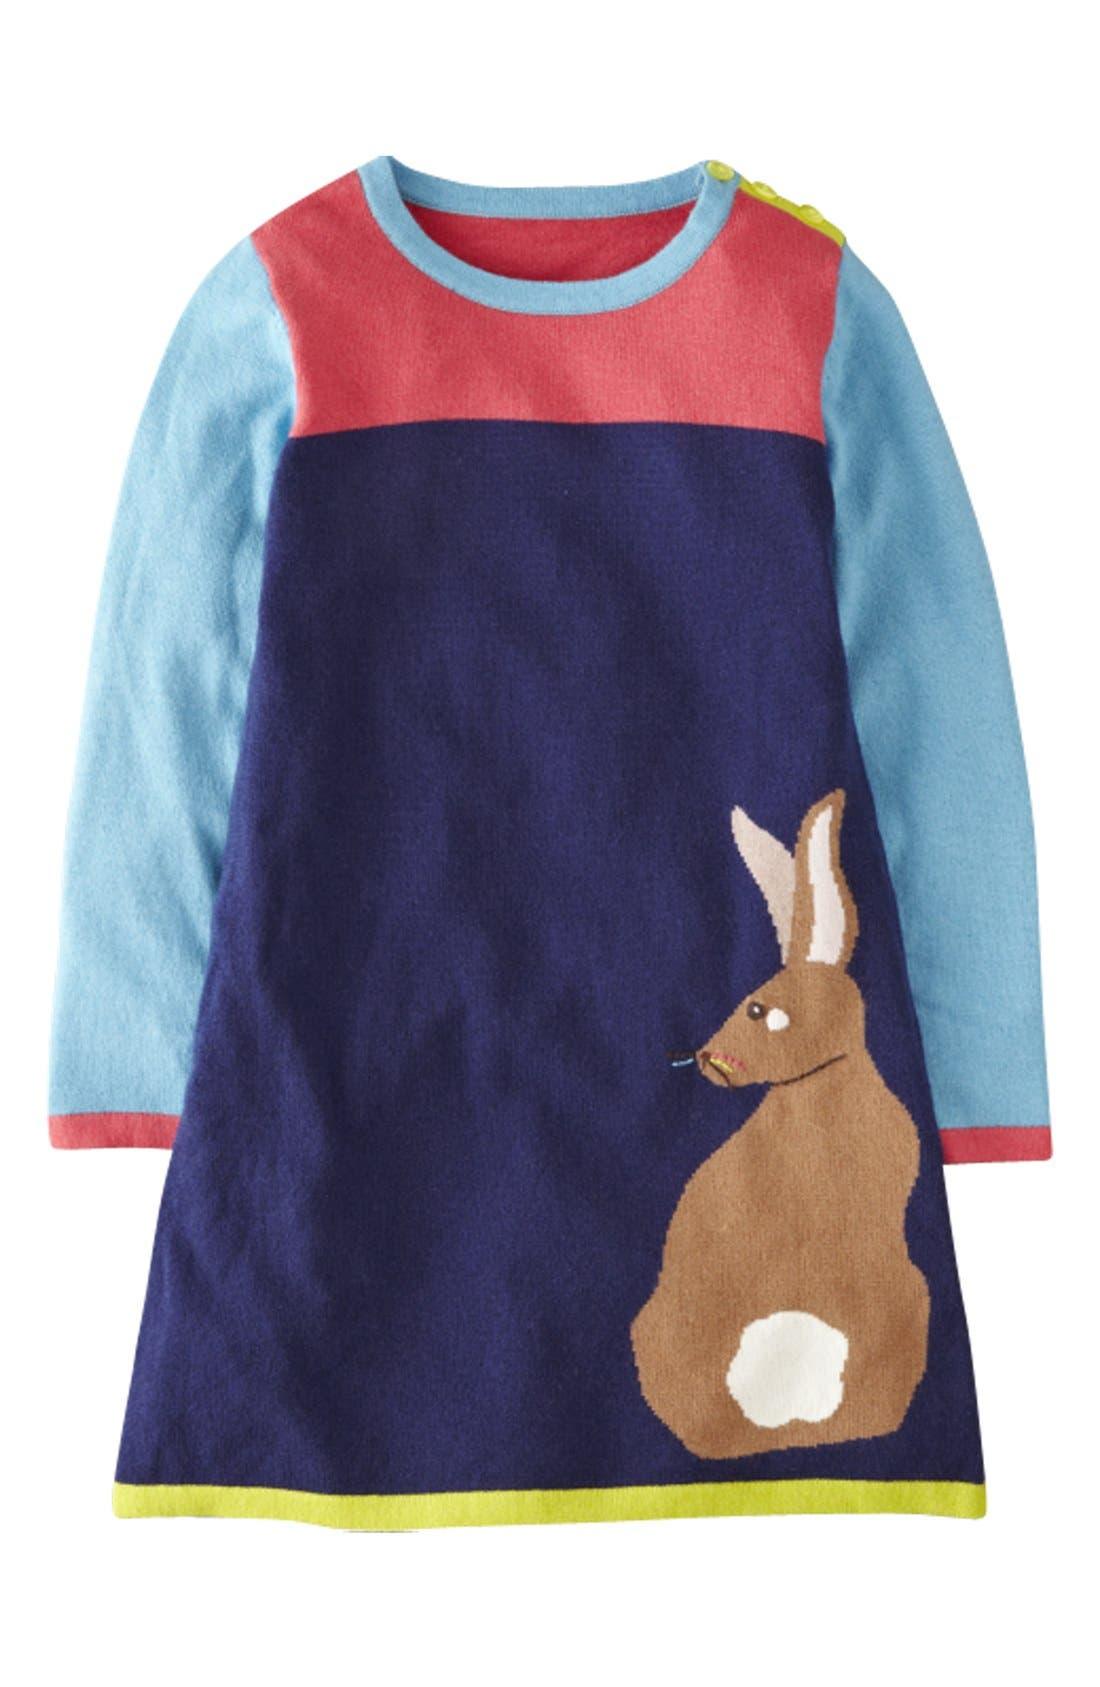 Main Image - Mini Boden 'Woodland' Knit Dress (Toddler Girls)